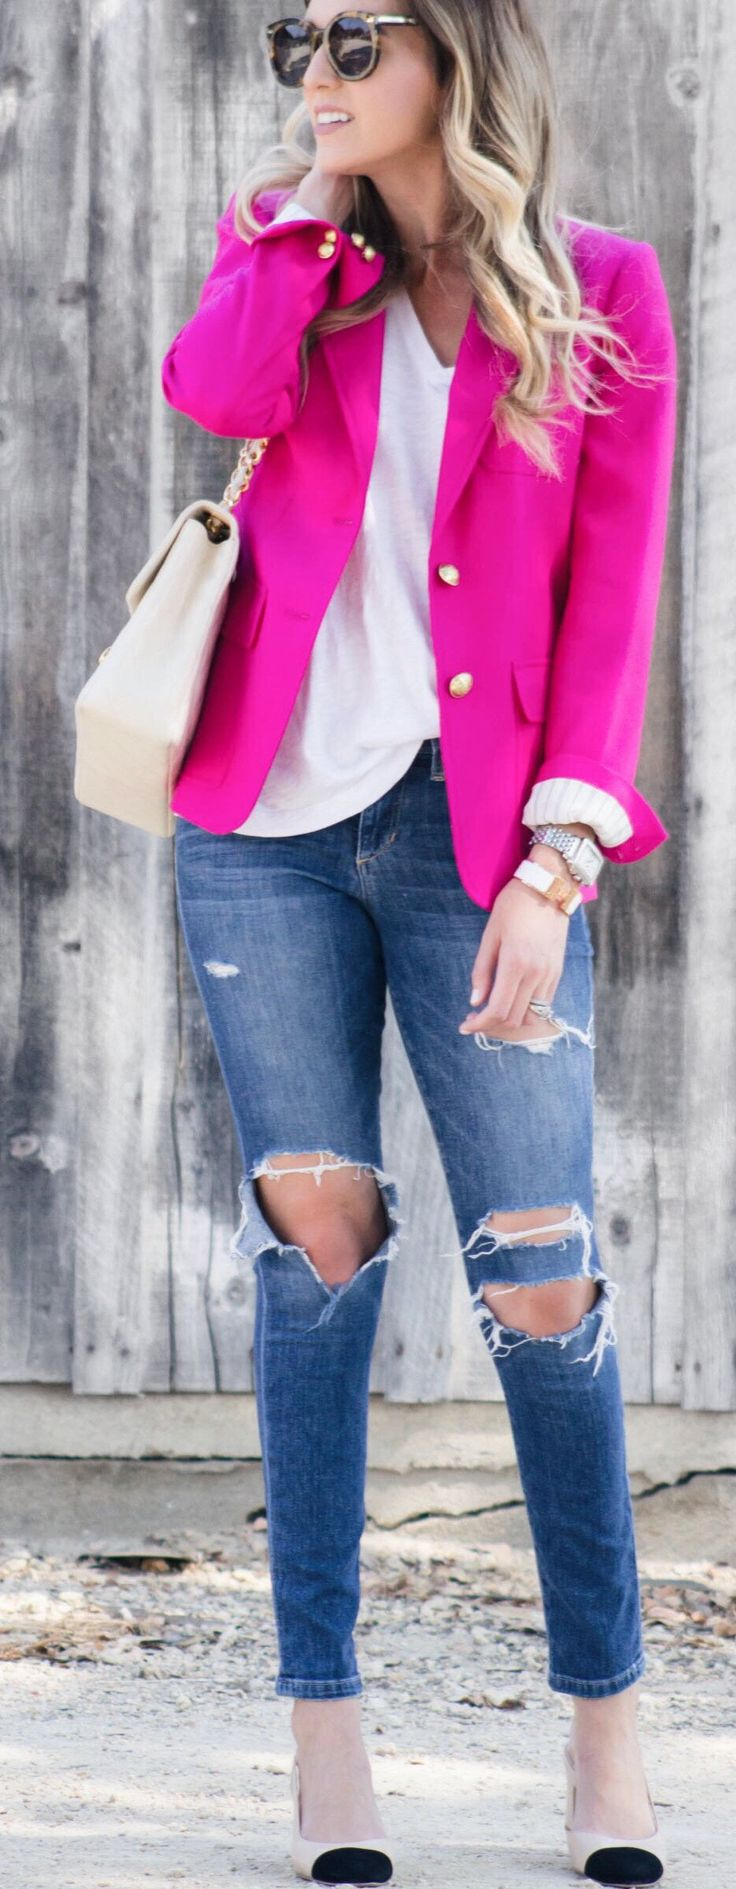 incredible pink blazer outfit women 8